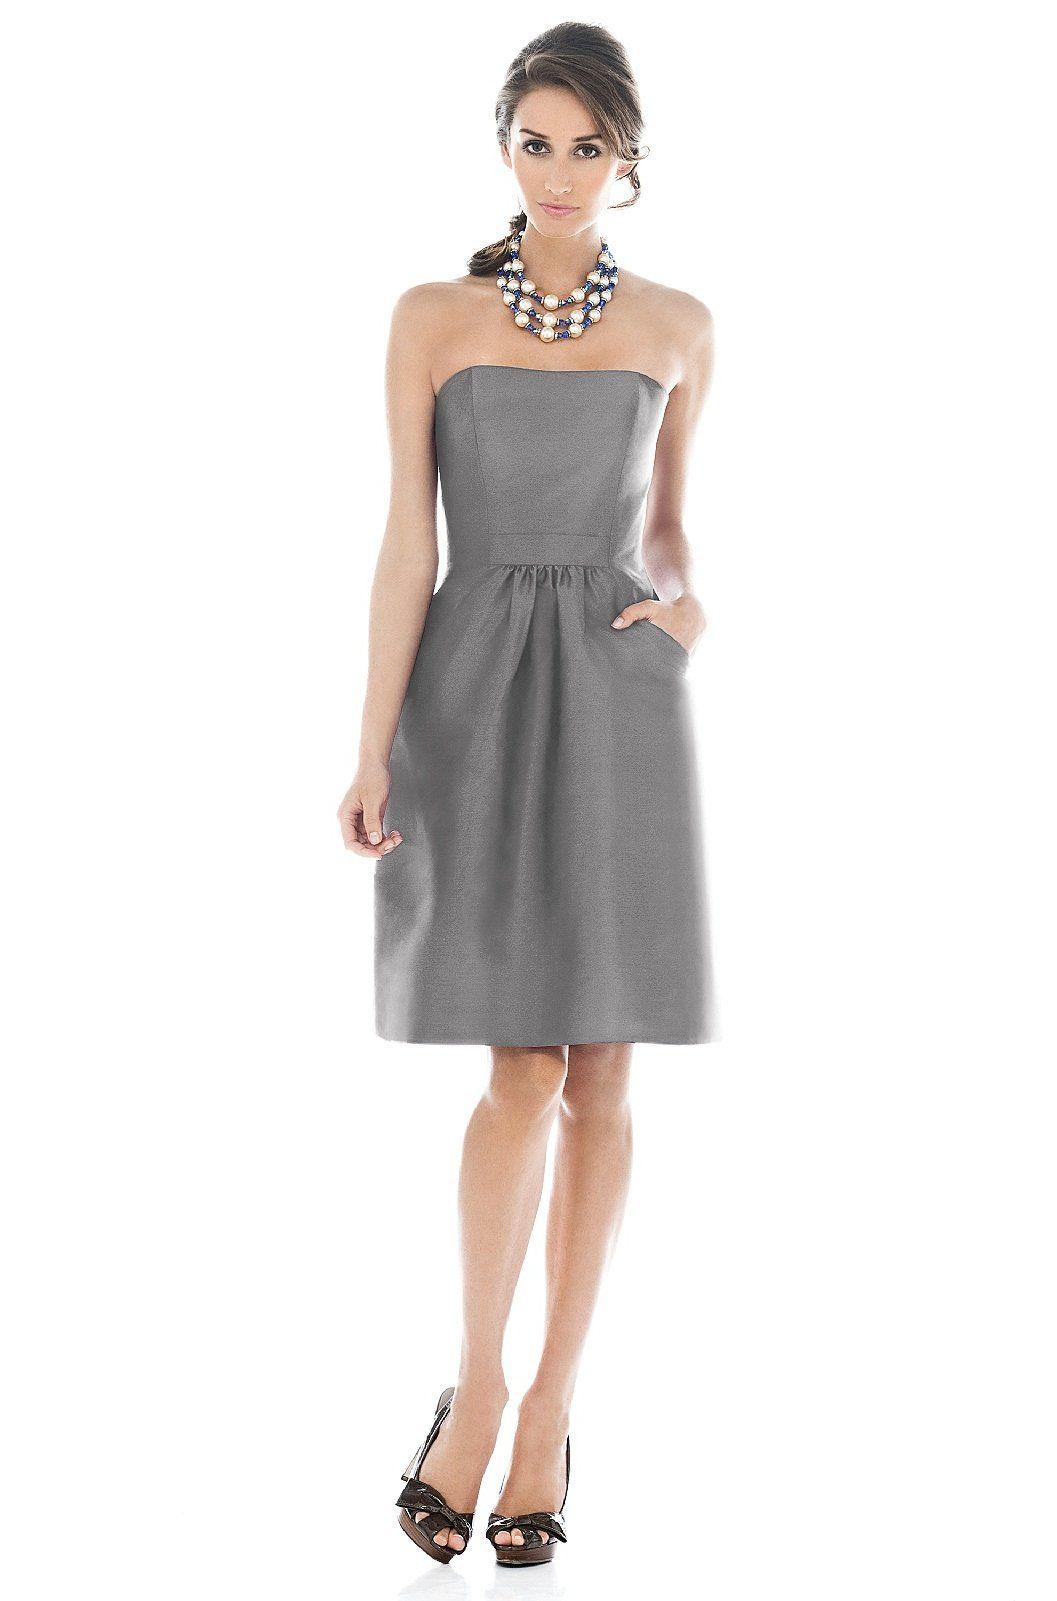 Alfred sung d508 bridesmaid dress weddington way dress alfred sung d508 bridesmaid dress weddington way ombrellifo Choice Image